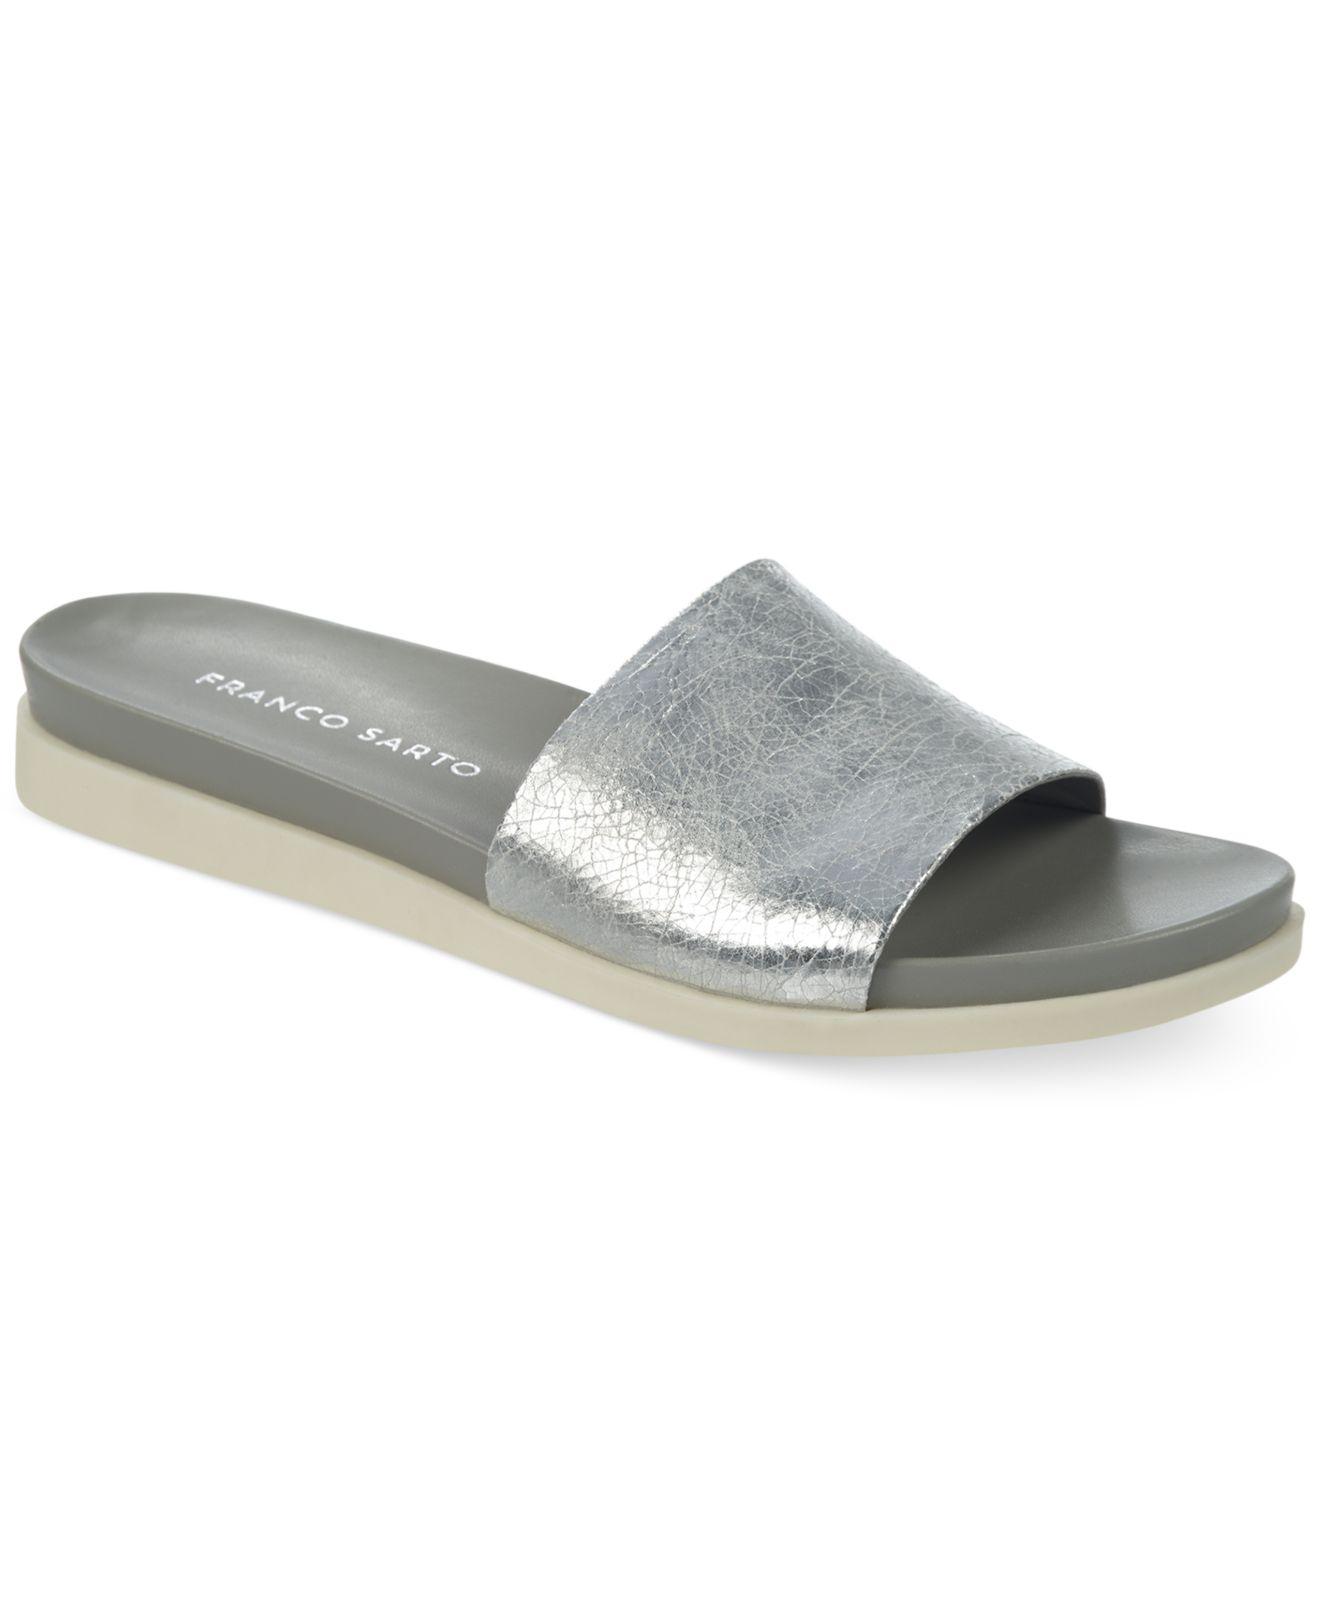 Lyst Franco Sarto Lumina Flat Slide Sandals In Metallic